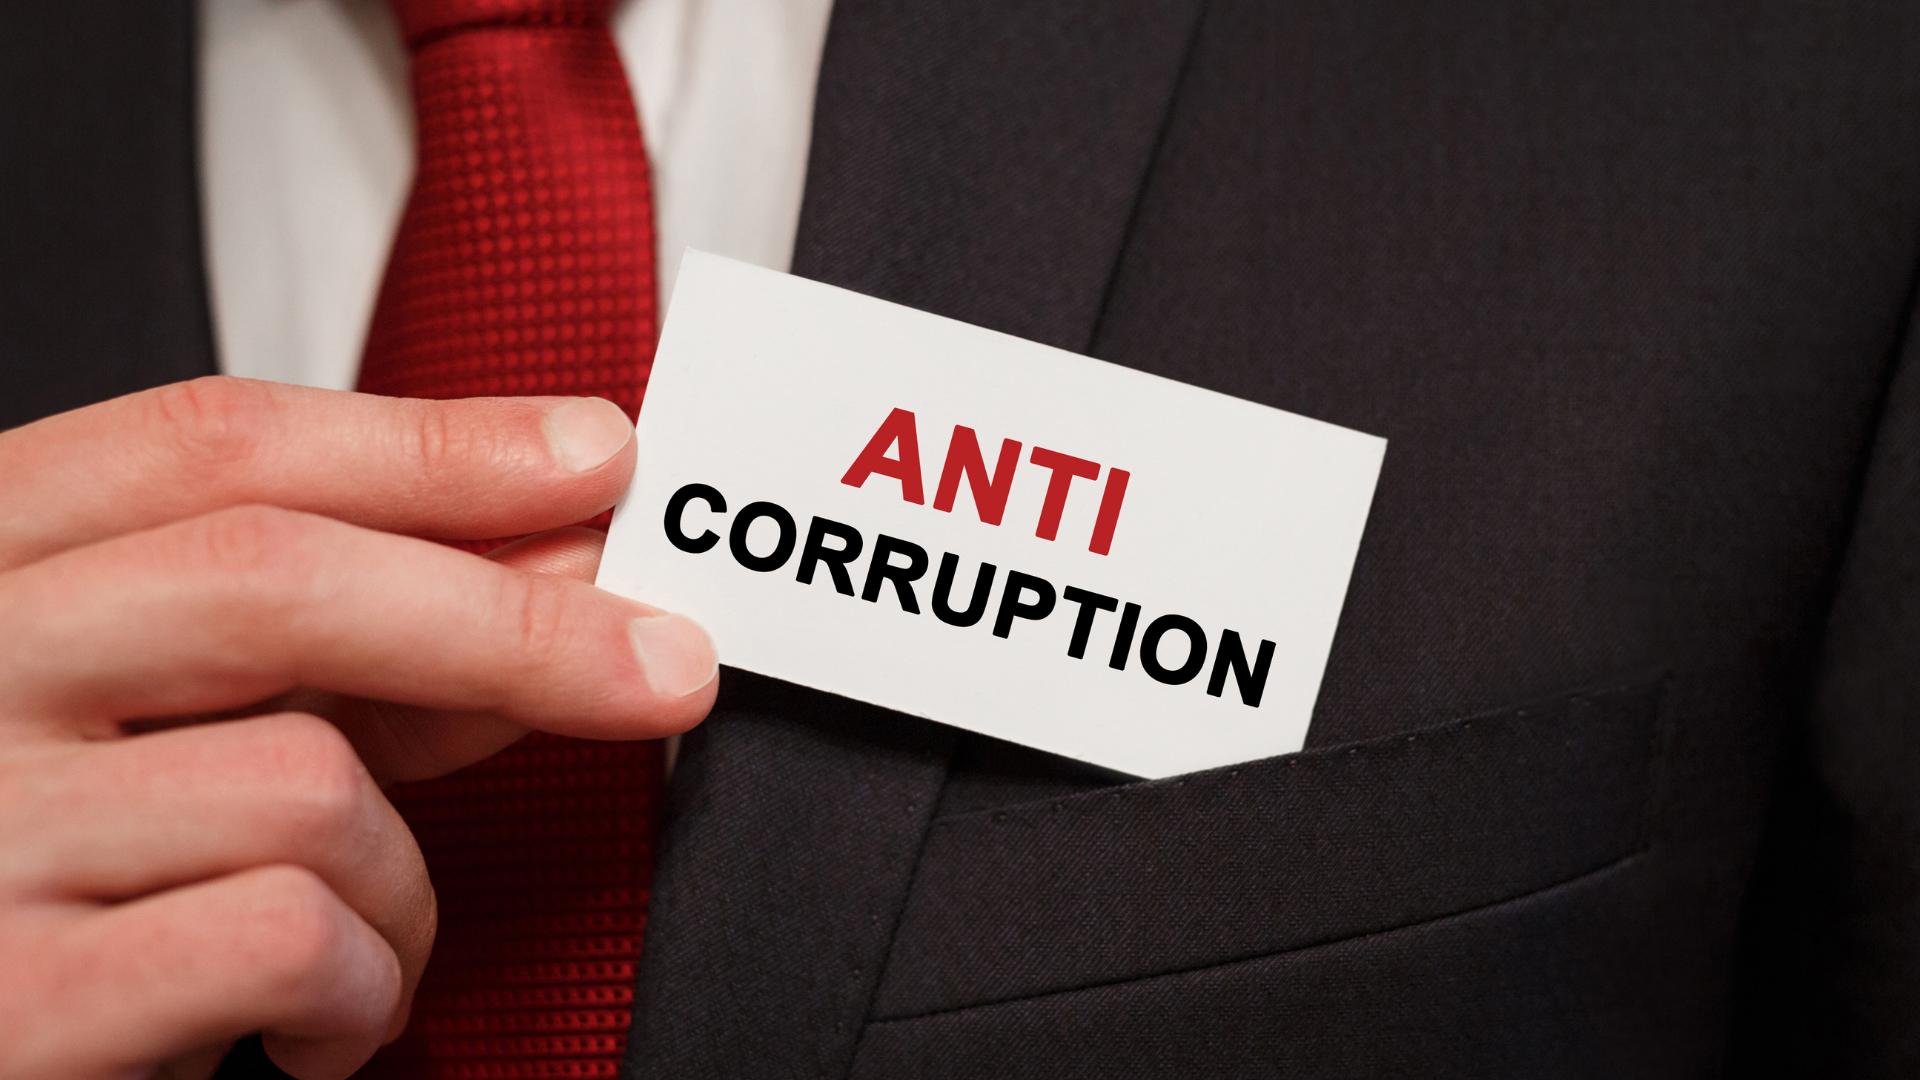 Anti-corruption and Criminal Compliance